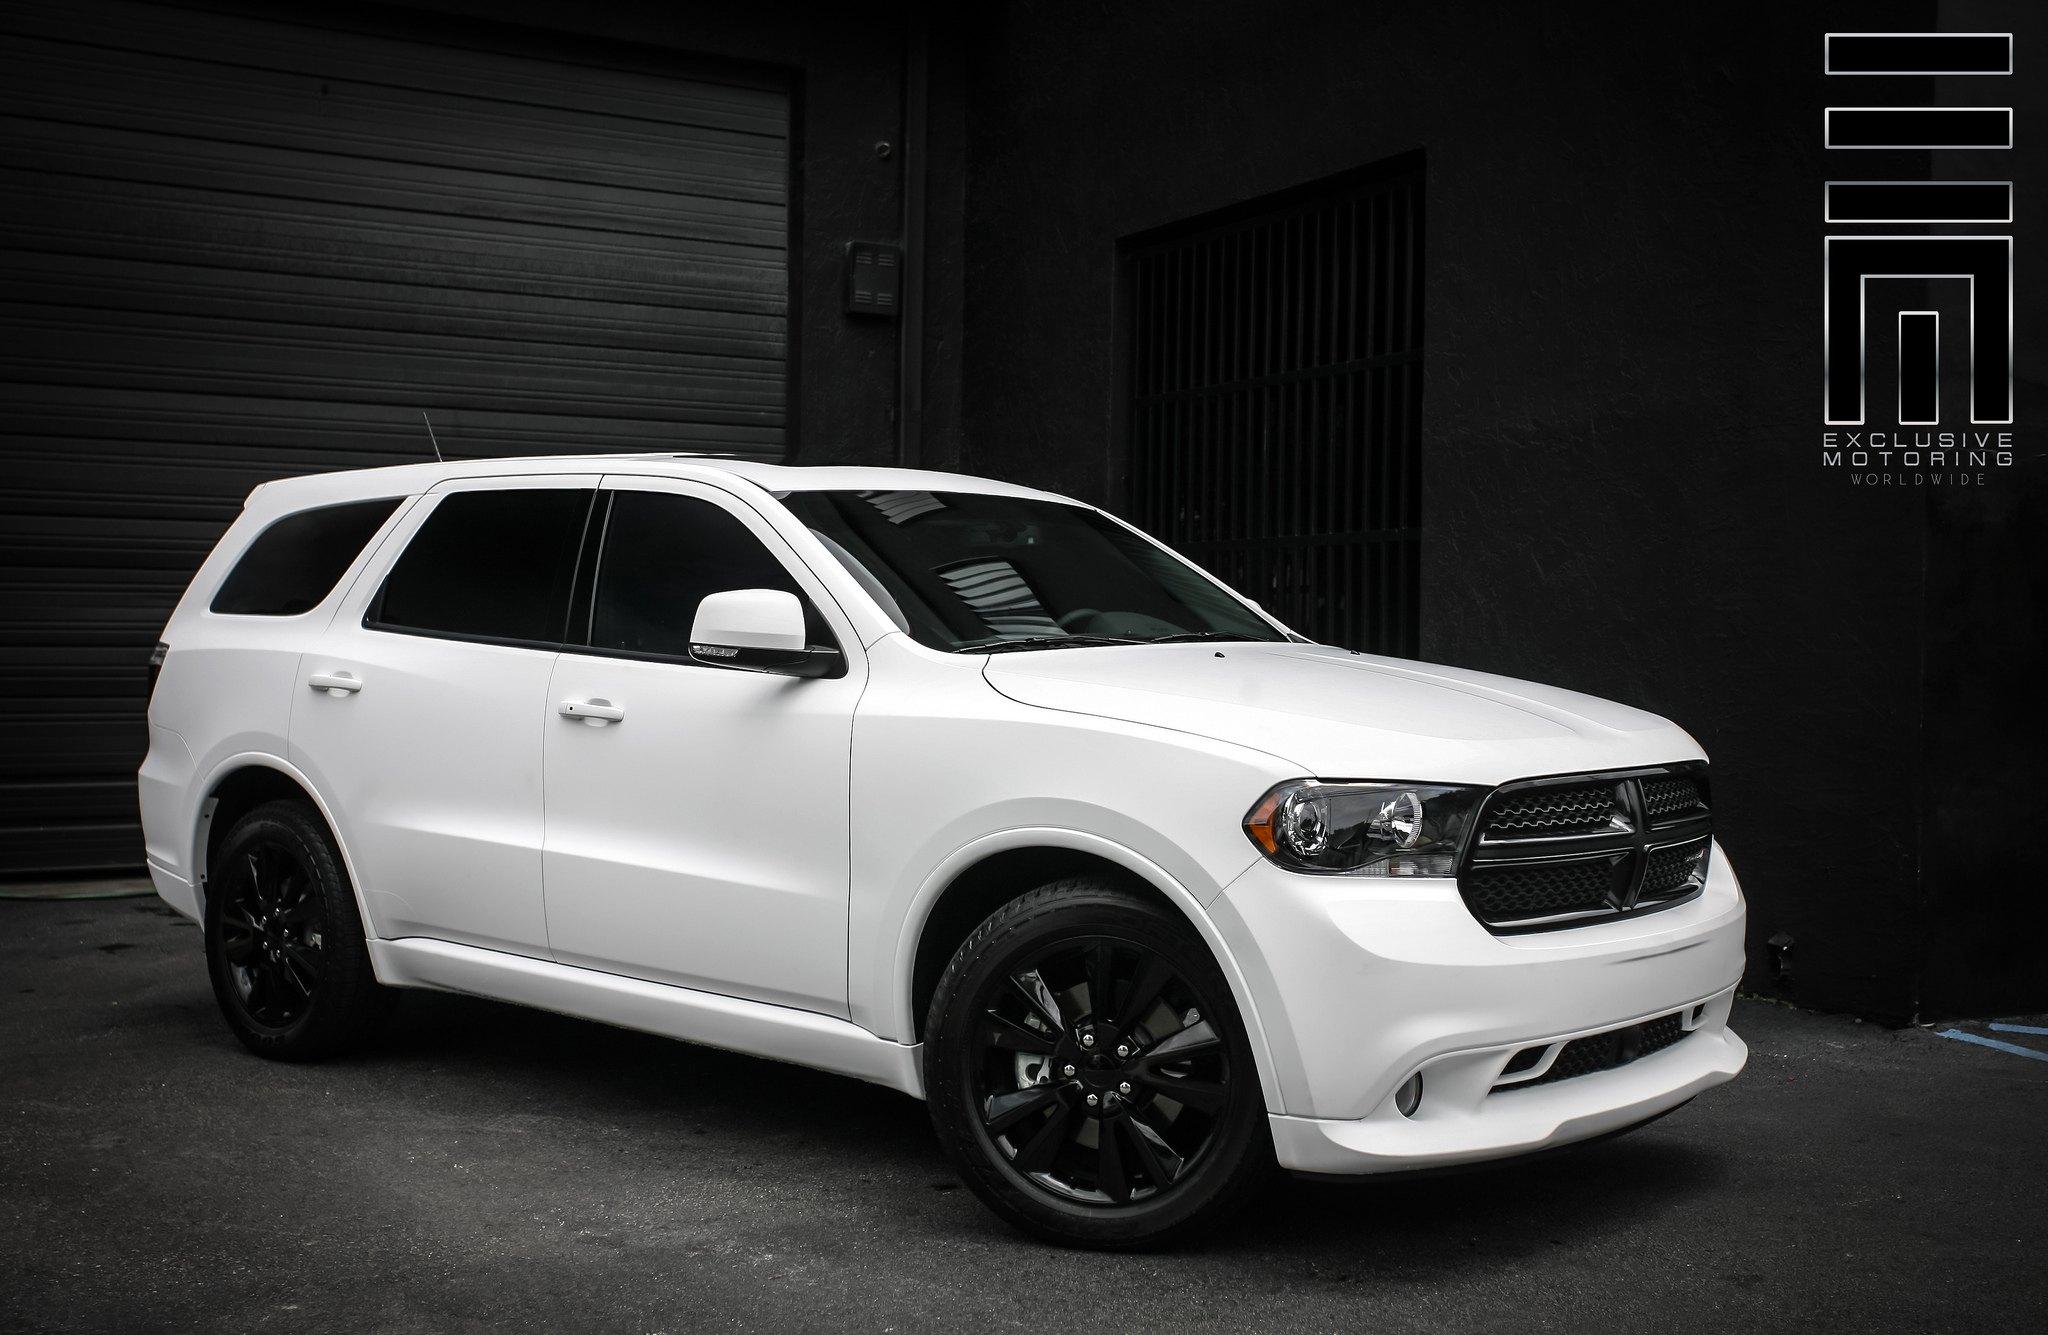 Snow White Dodge Durango RT by Exclusive Motoring  CARiDcom Gallery